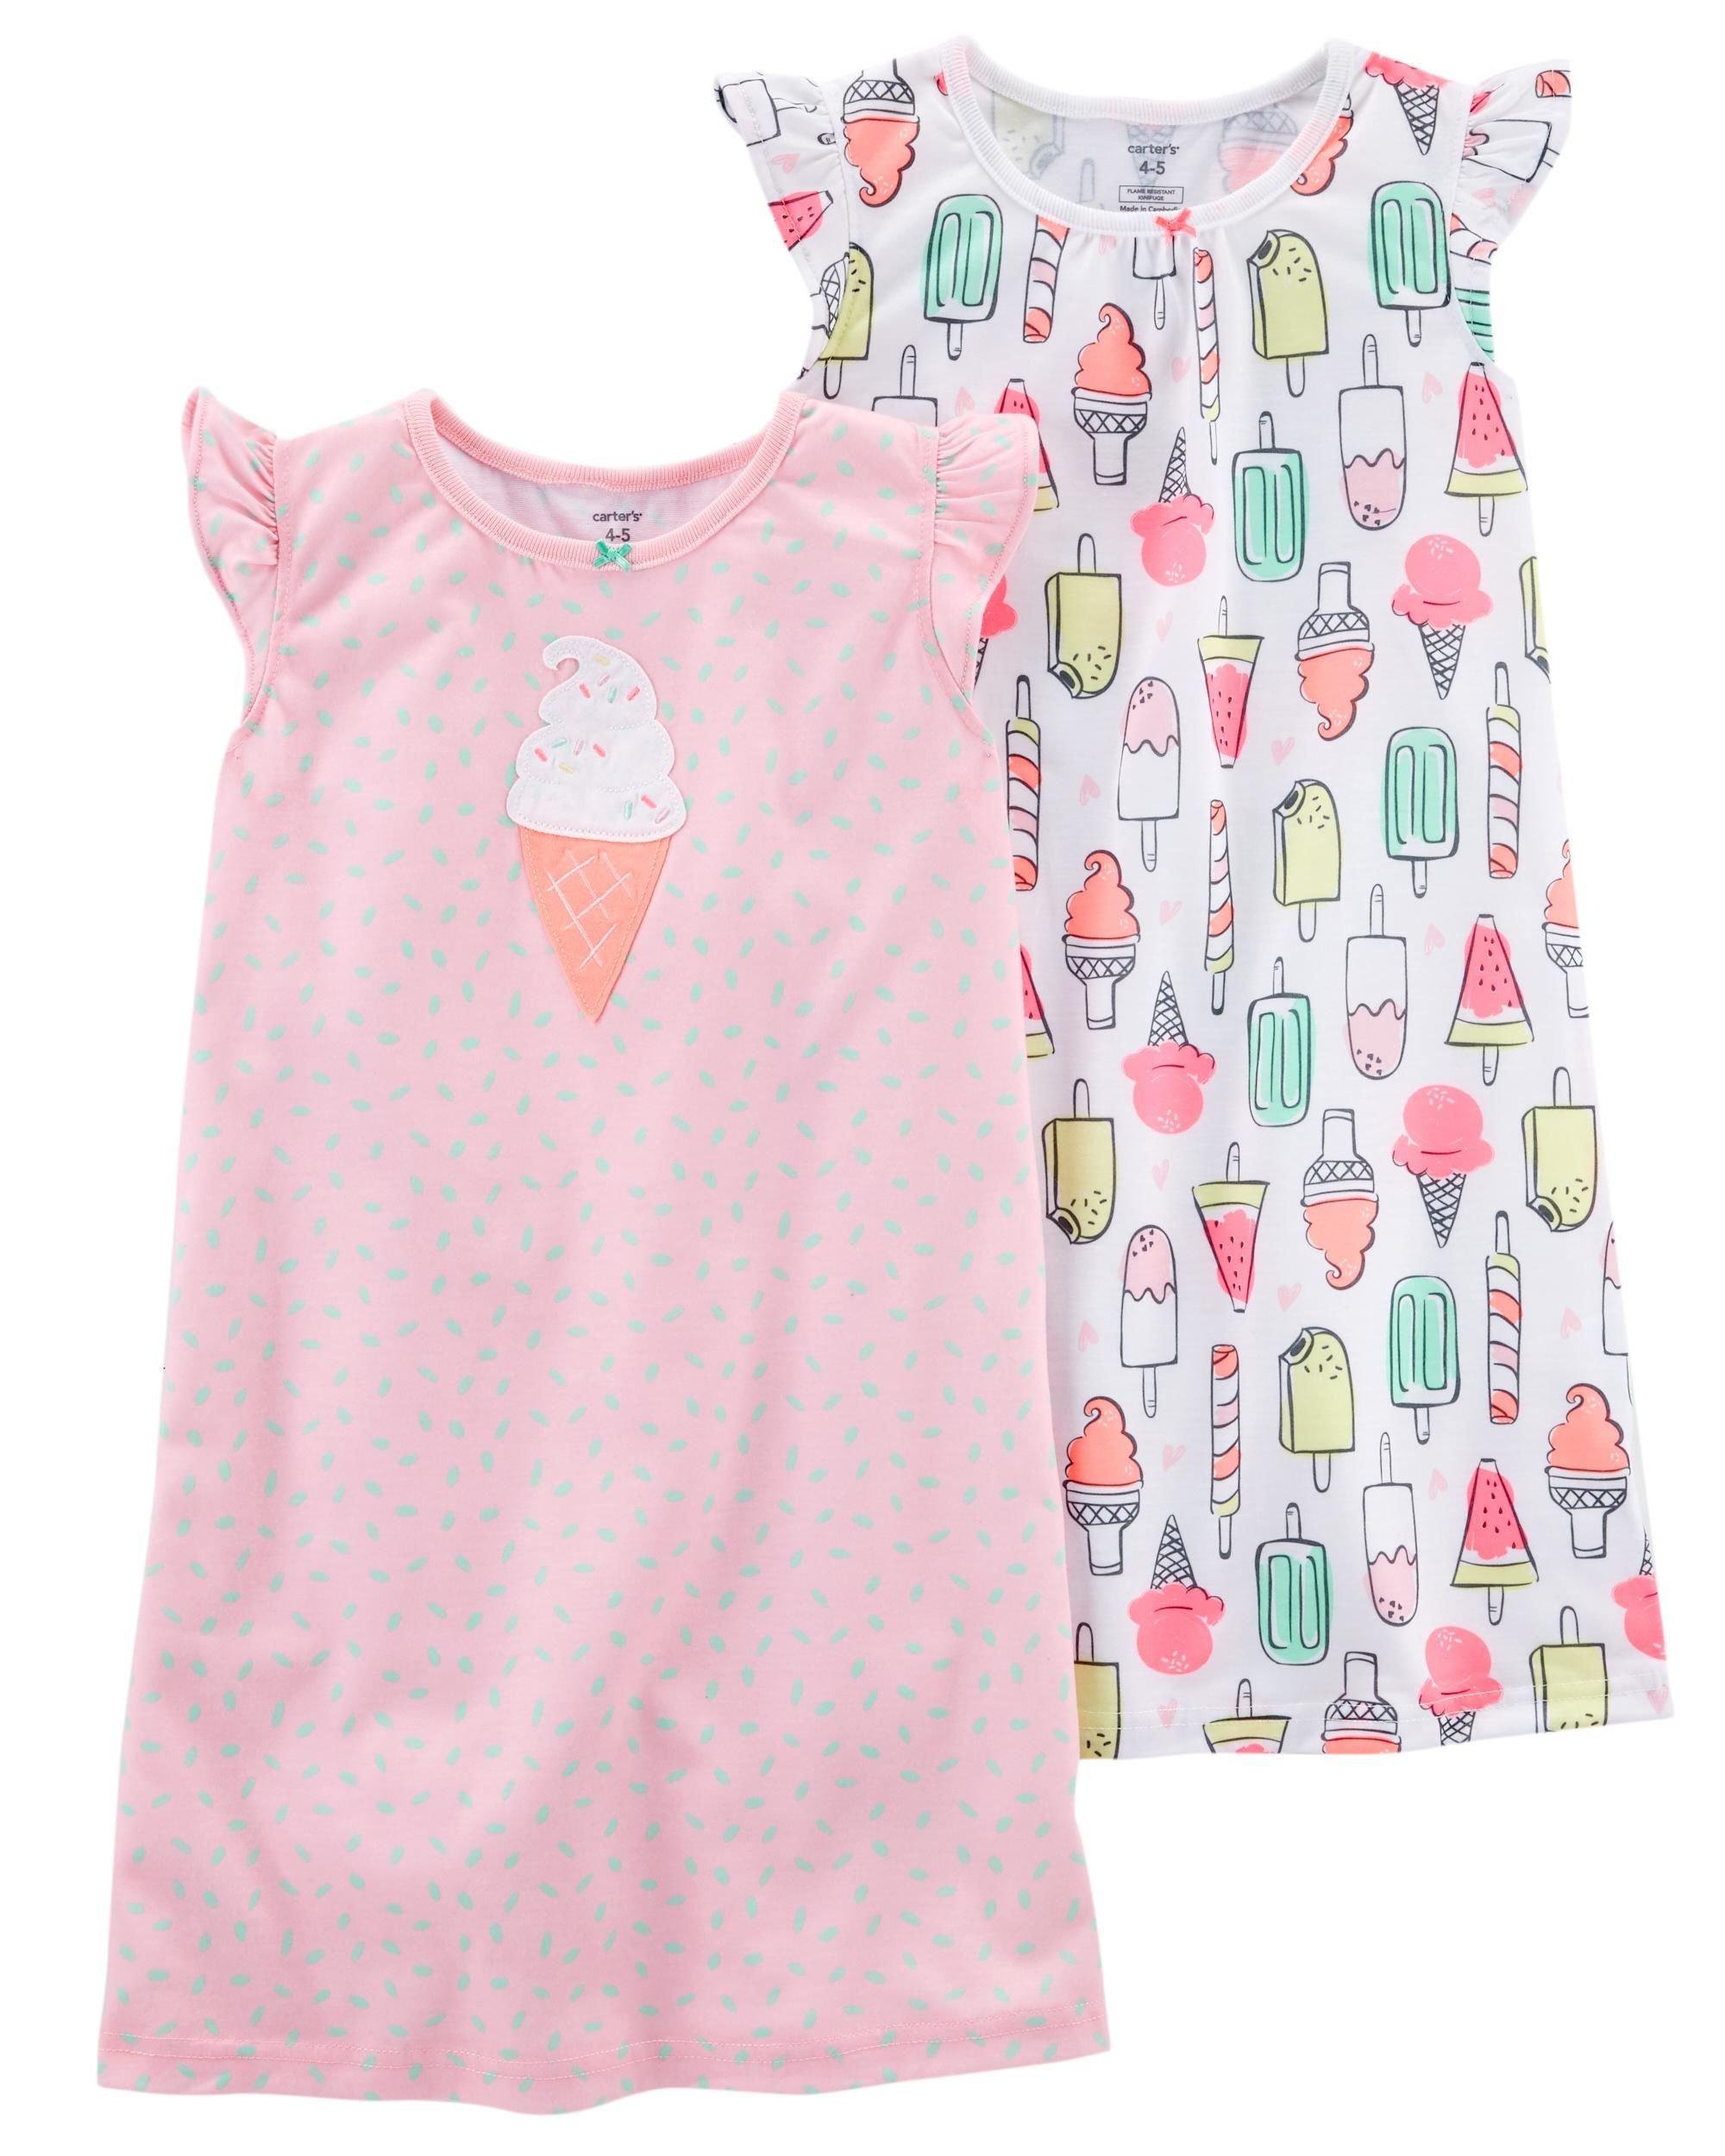 Carter's Girls 4-14 2-Pk. Ice Cream Print Sleep Gowns 6/7